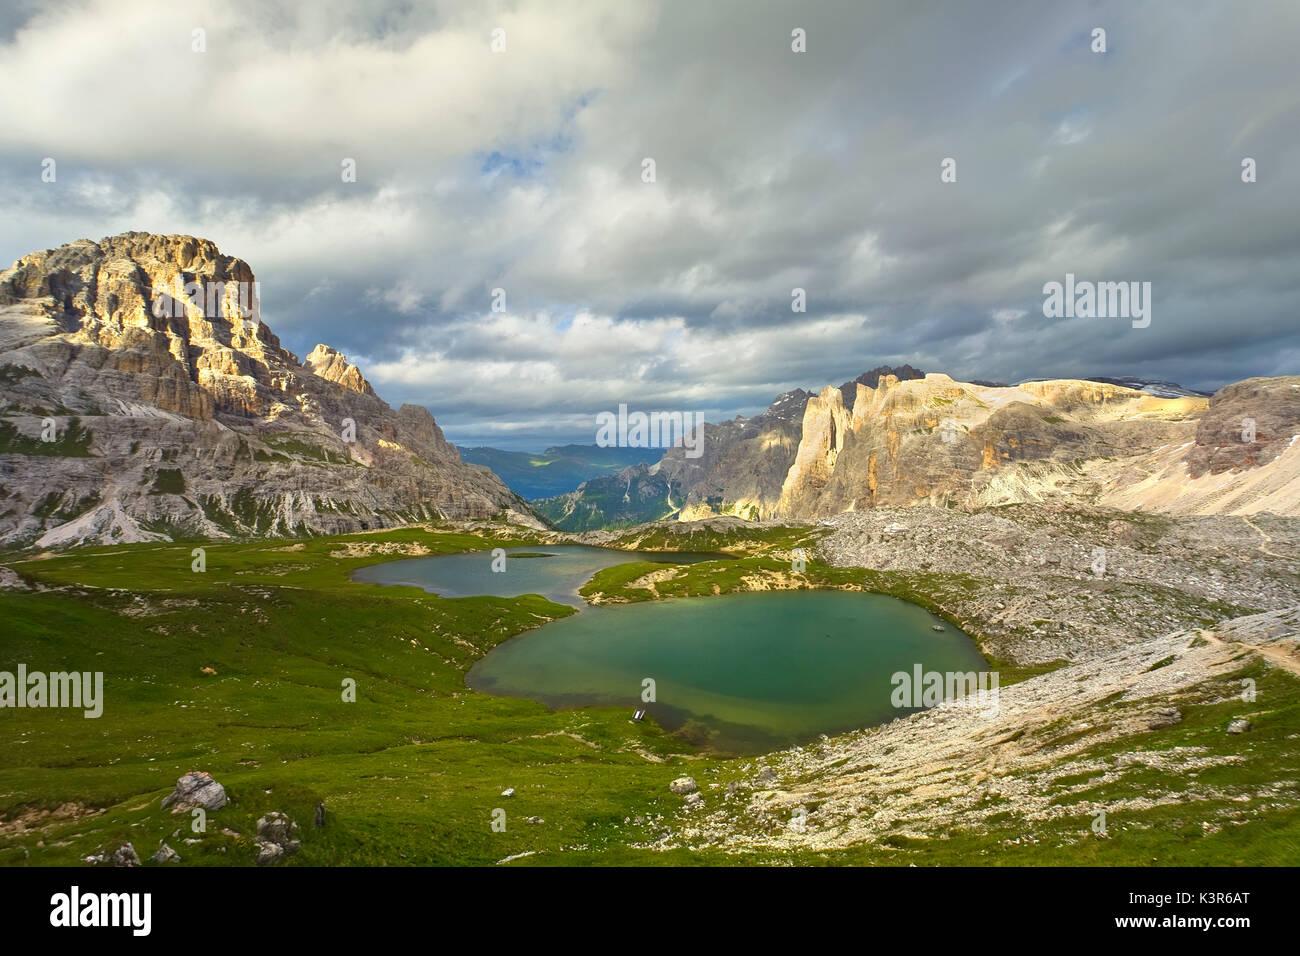 Dolomites, Trentino alto Adige, Italy. Sunset at Ref. Locatelli - Stock Image